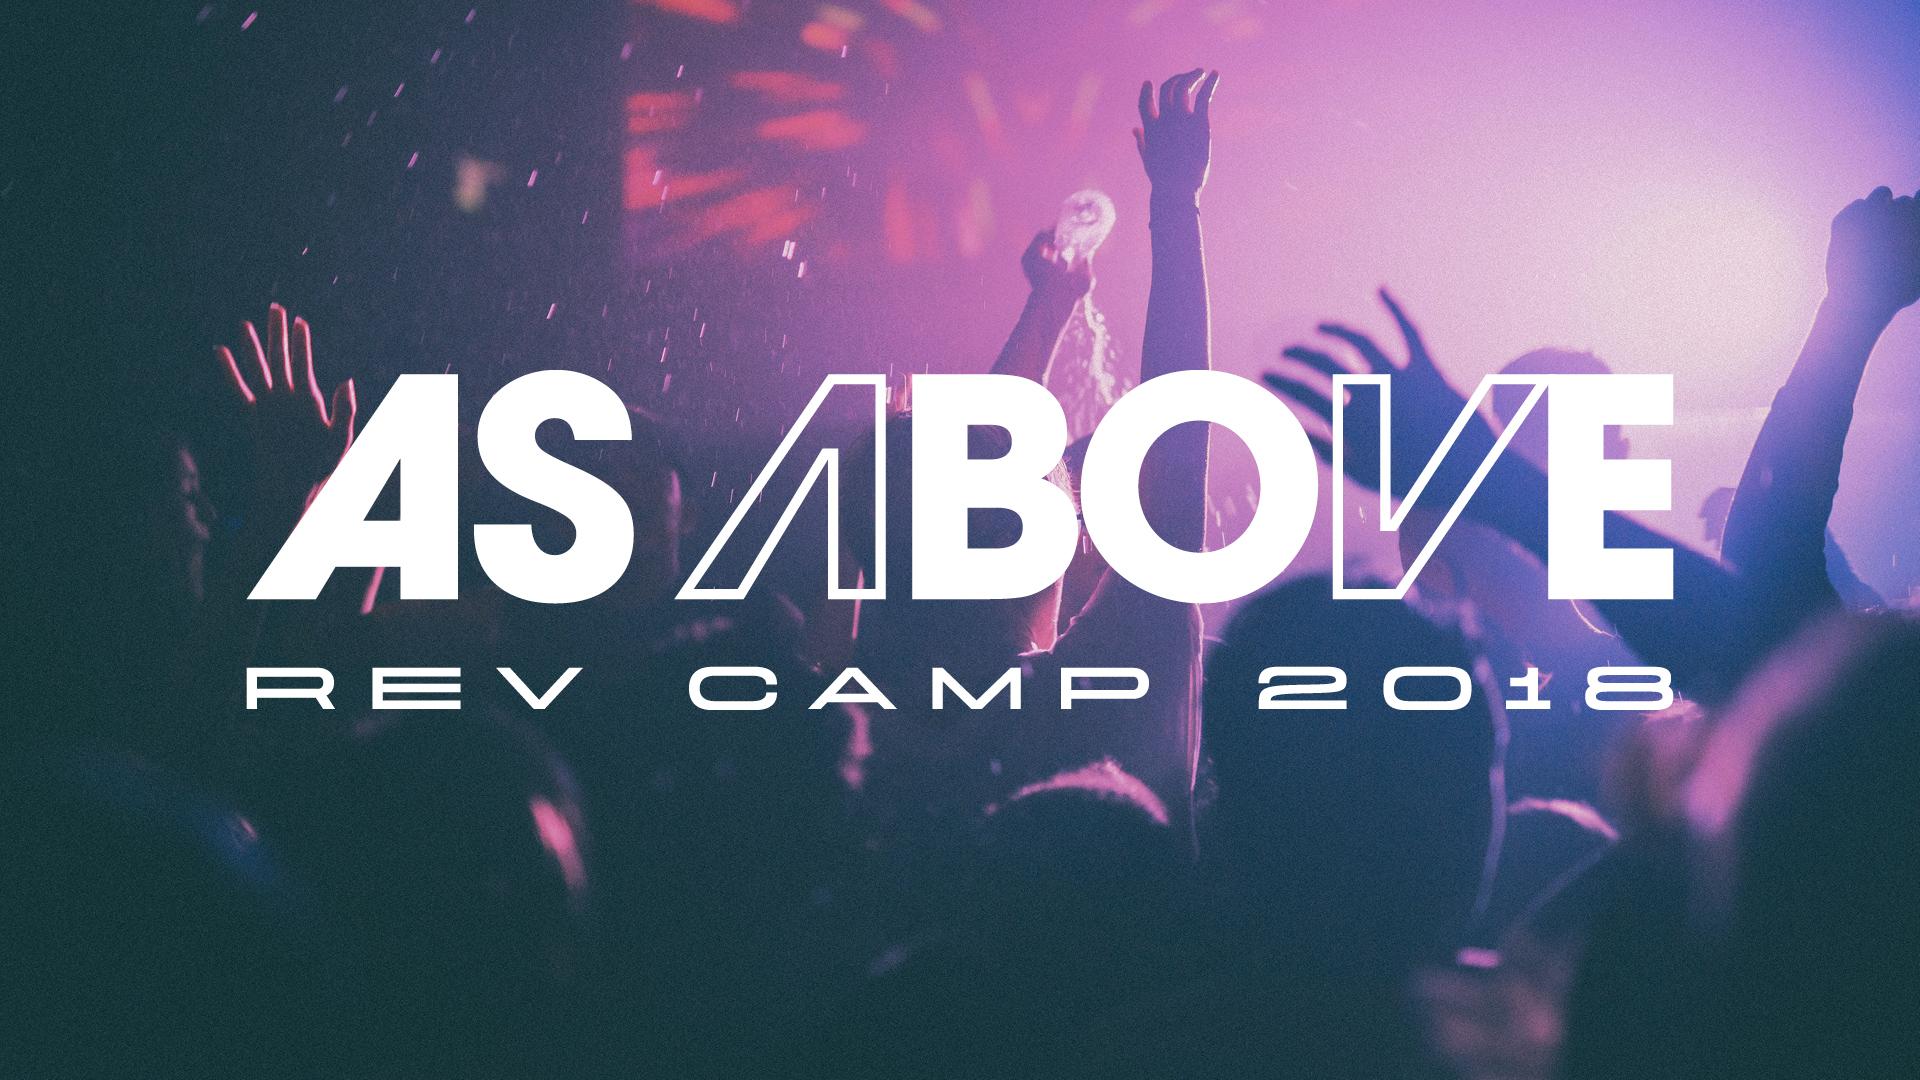 Rev Camp 2018 As Above Generic Slides6.jpg